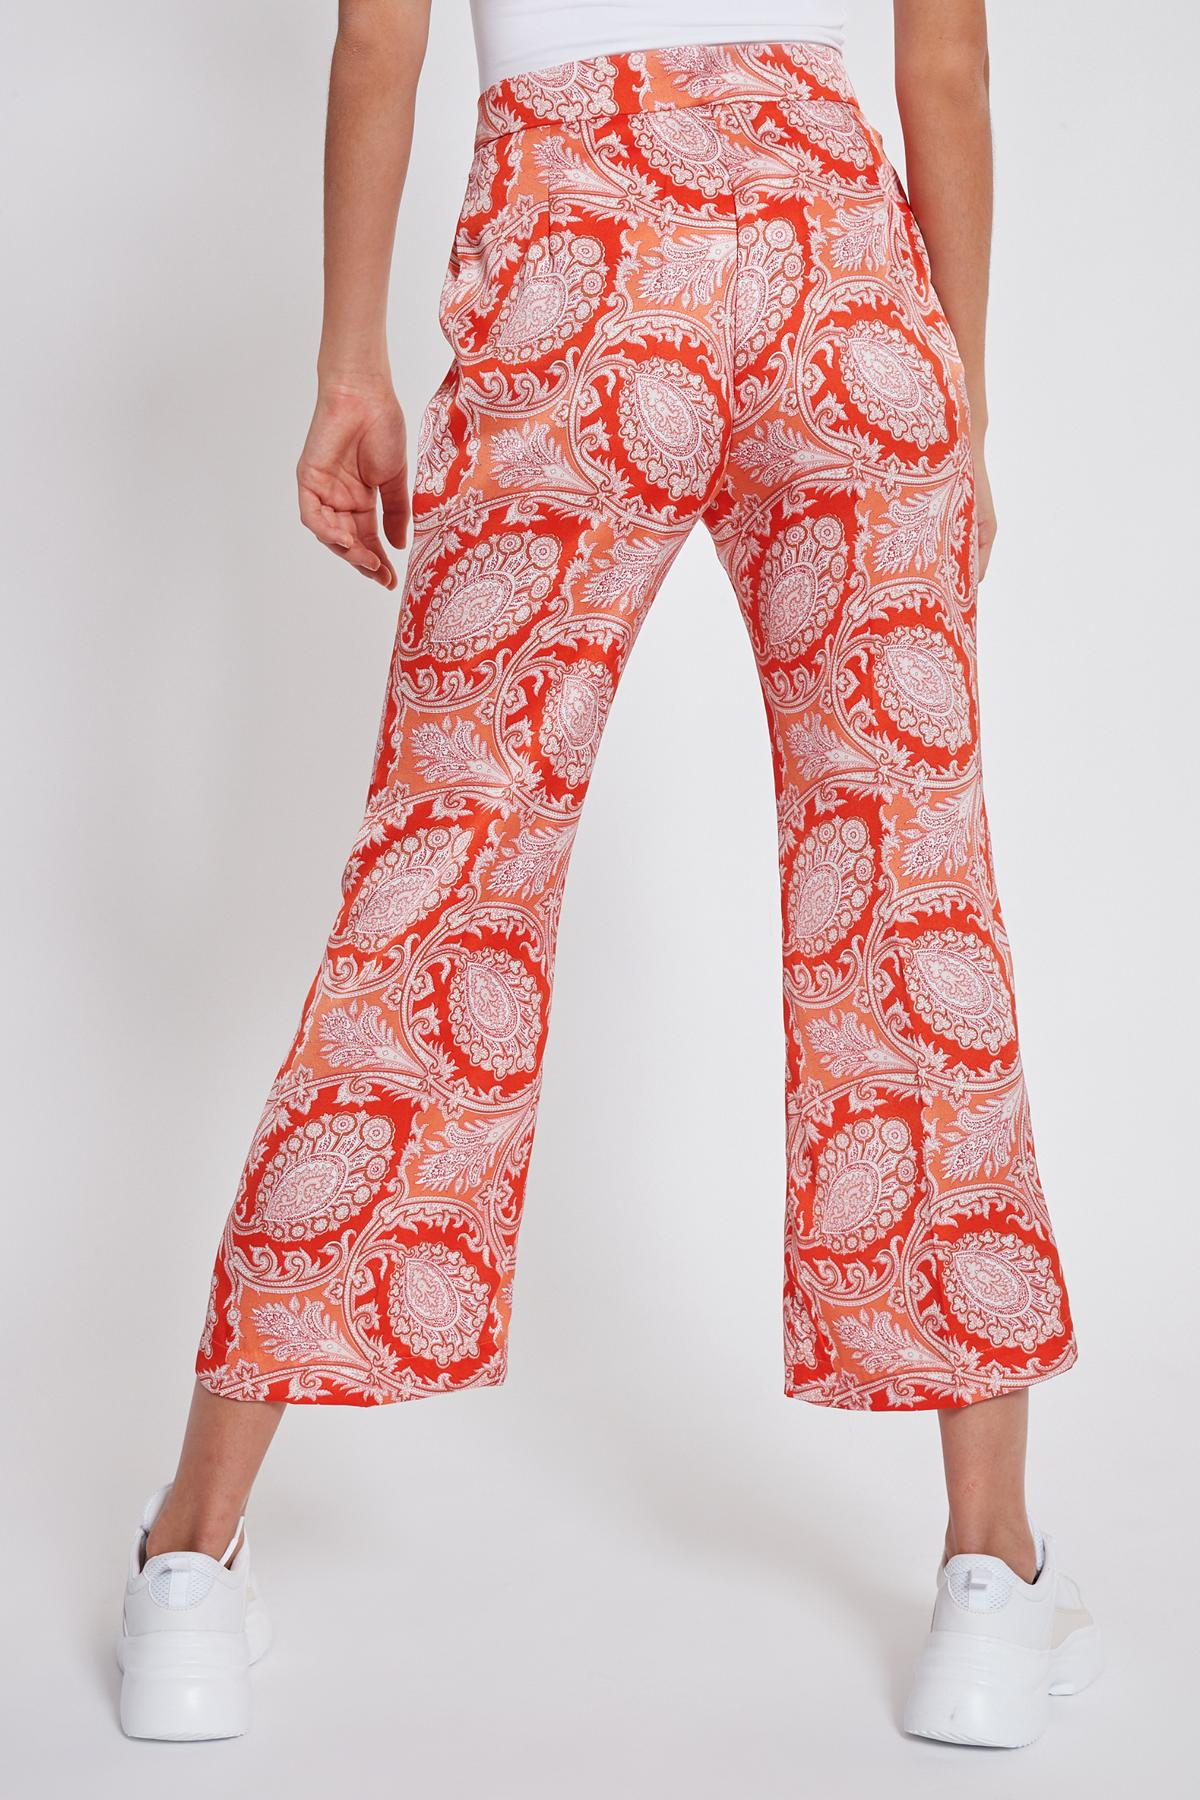 Rückansicht von Ana Alcazar Cropped Hose Tefris Rot  angezogen an Model